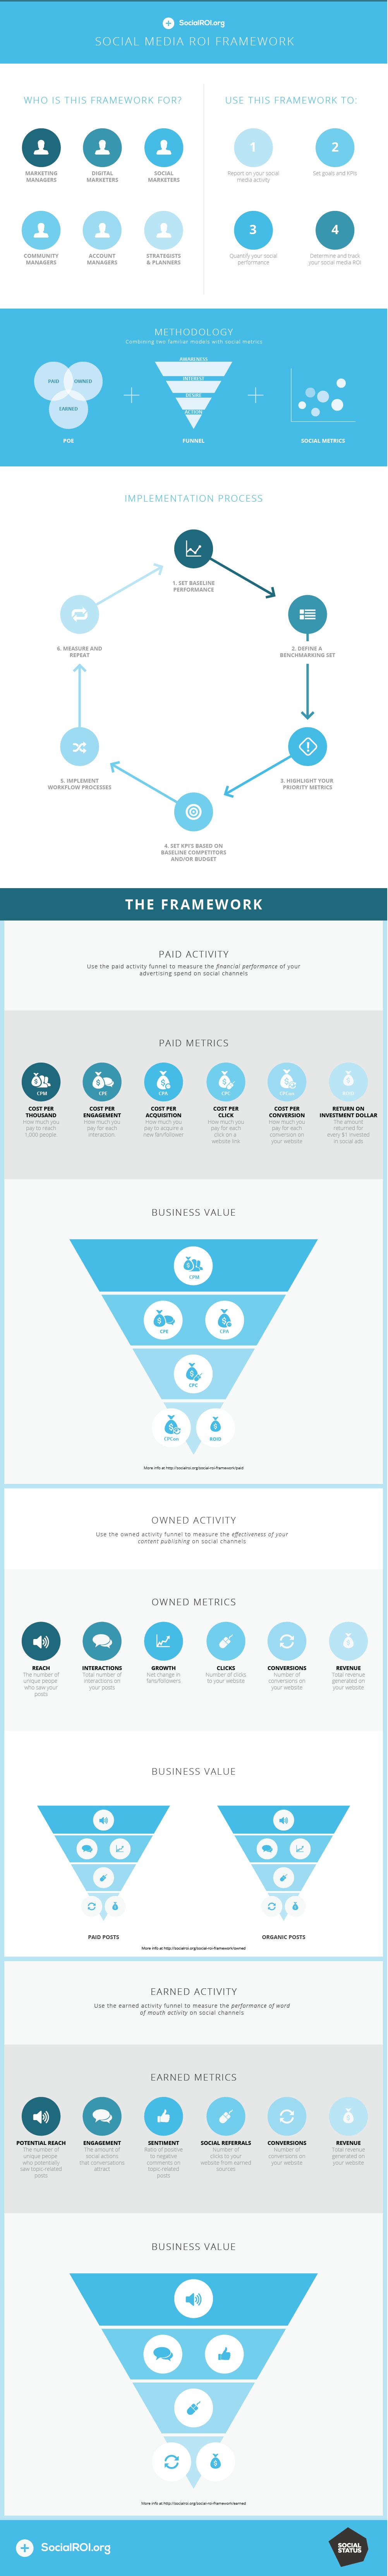 Social ROI Framework